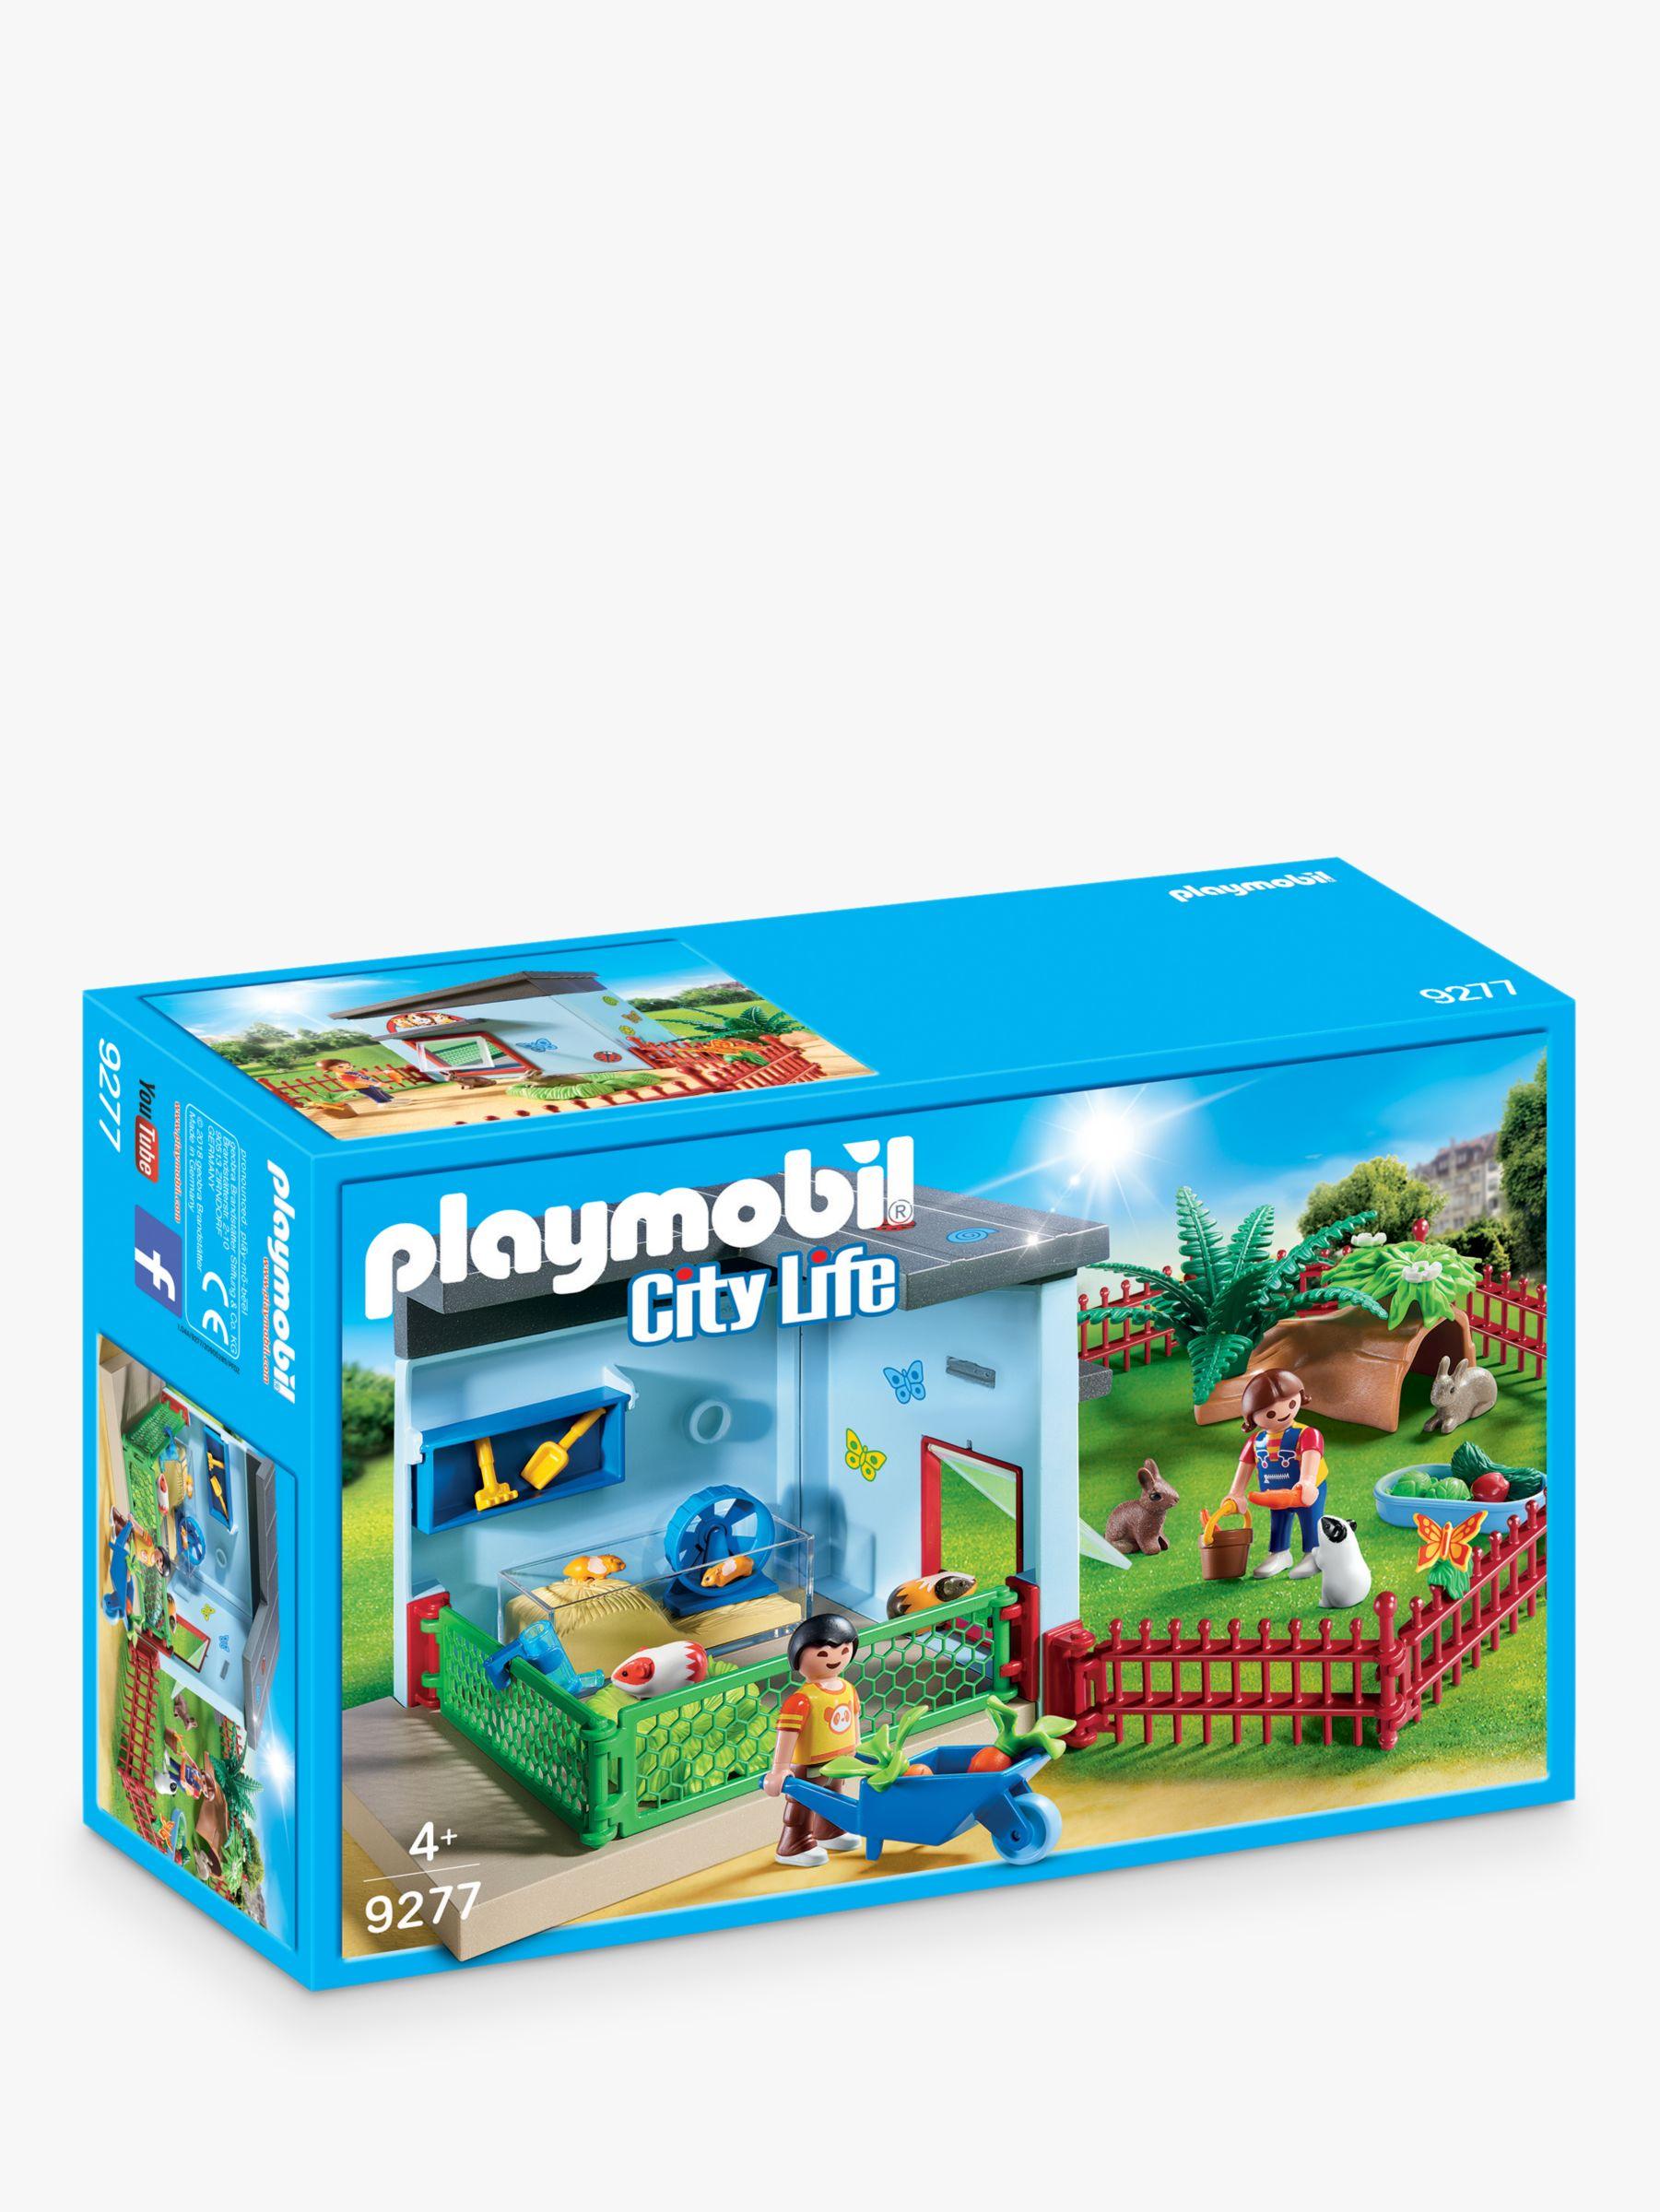 PLAYMOBIL Playmobil City Life 9277 Small Animal Boarding